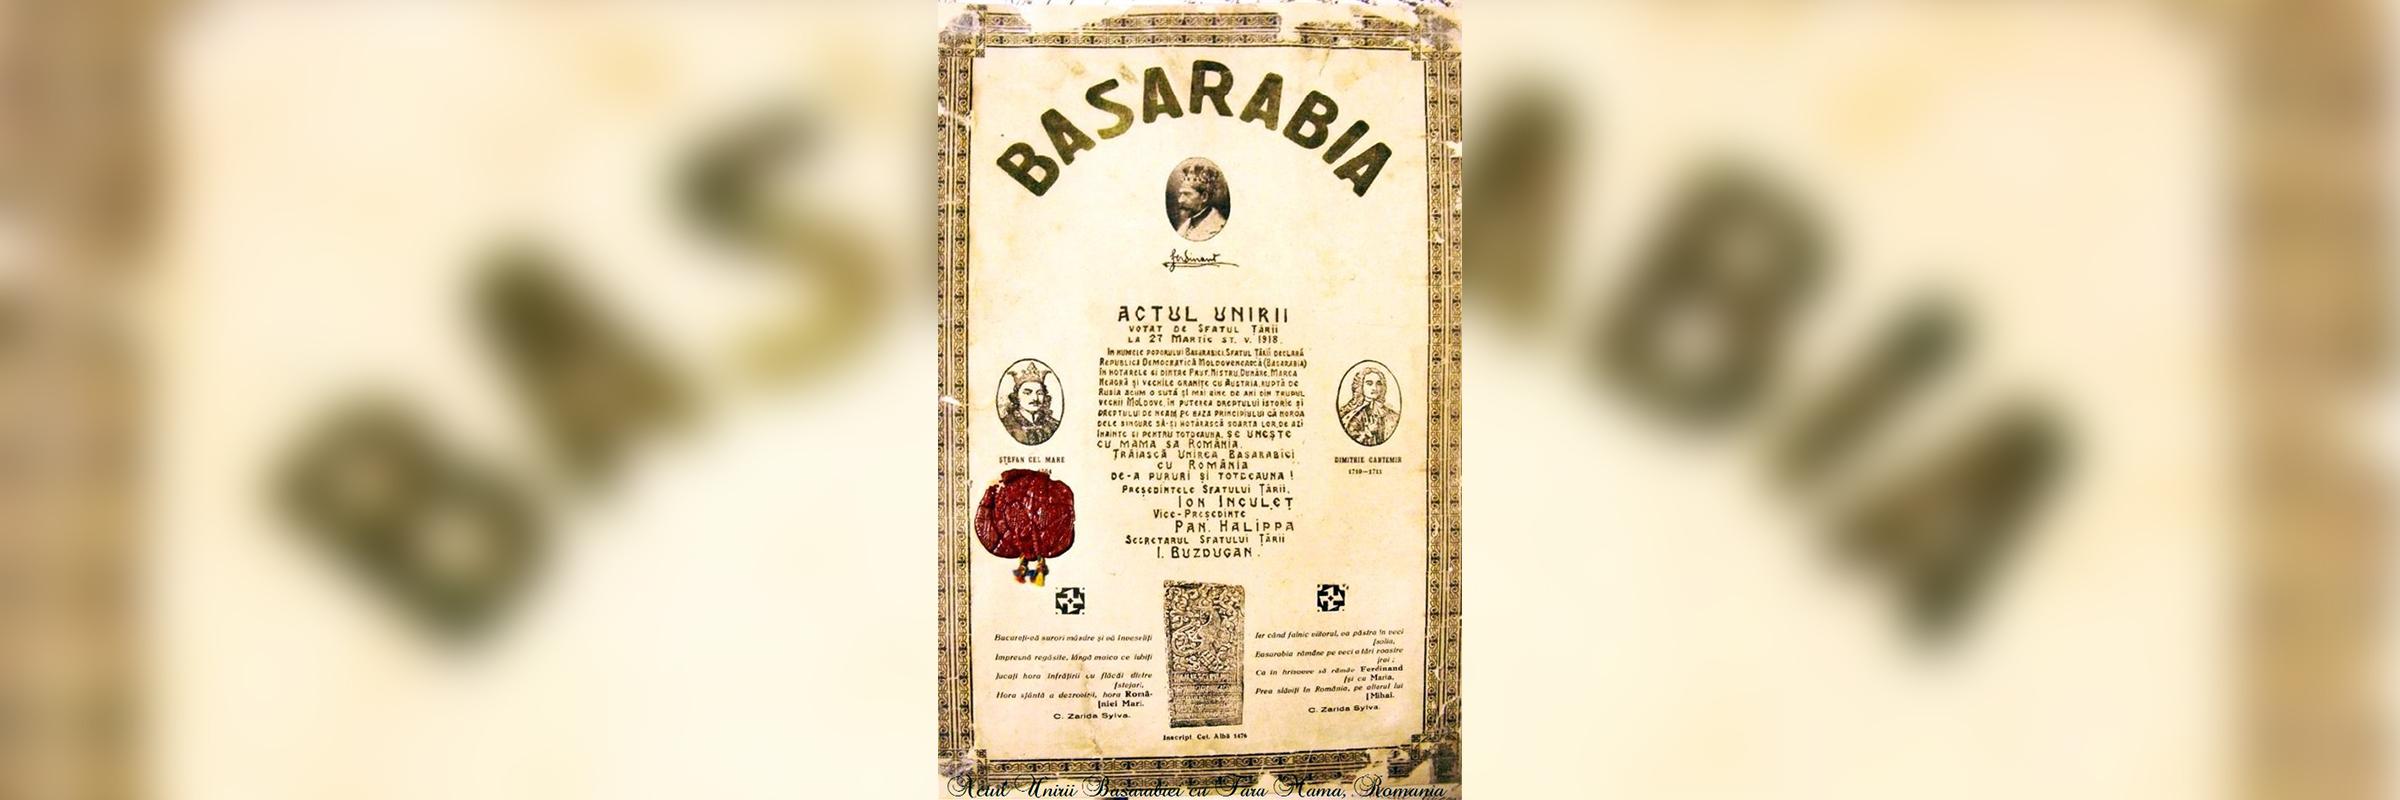 picatura_basarabia